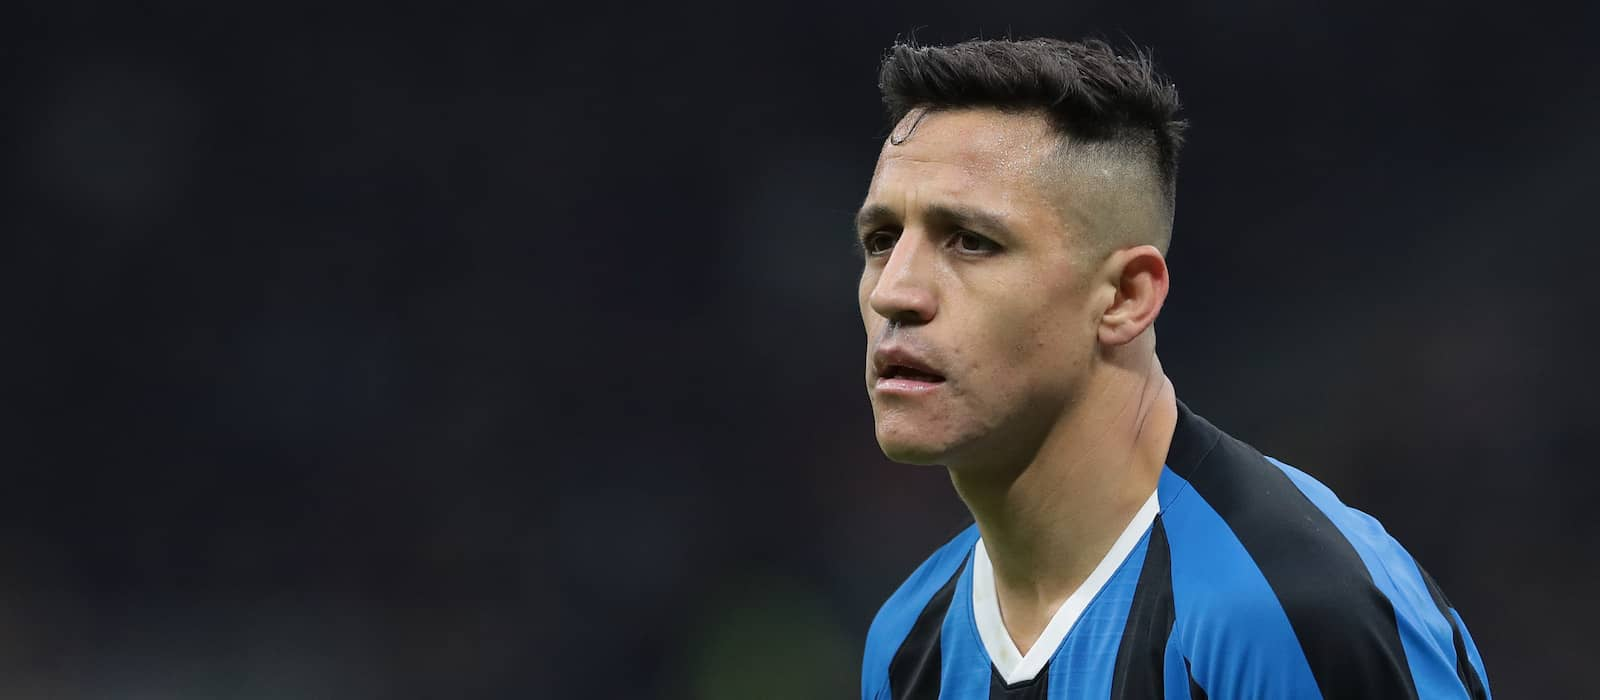 Alexis Sanchez to Inter Milan depends on huge Man United compensation payment